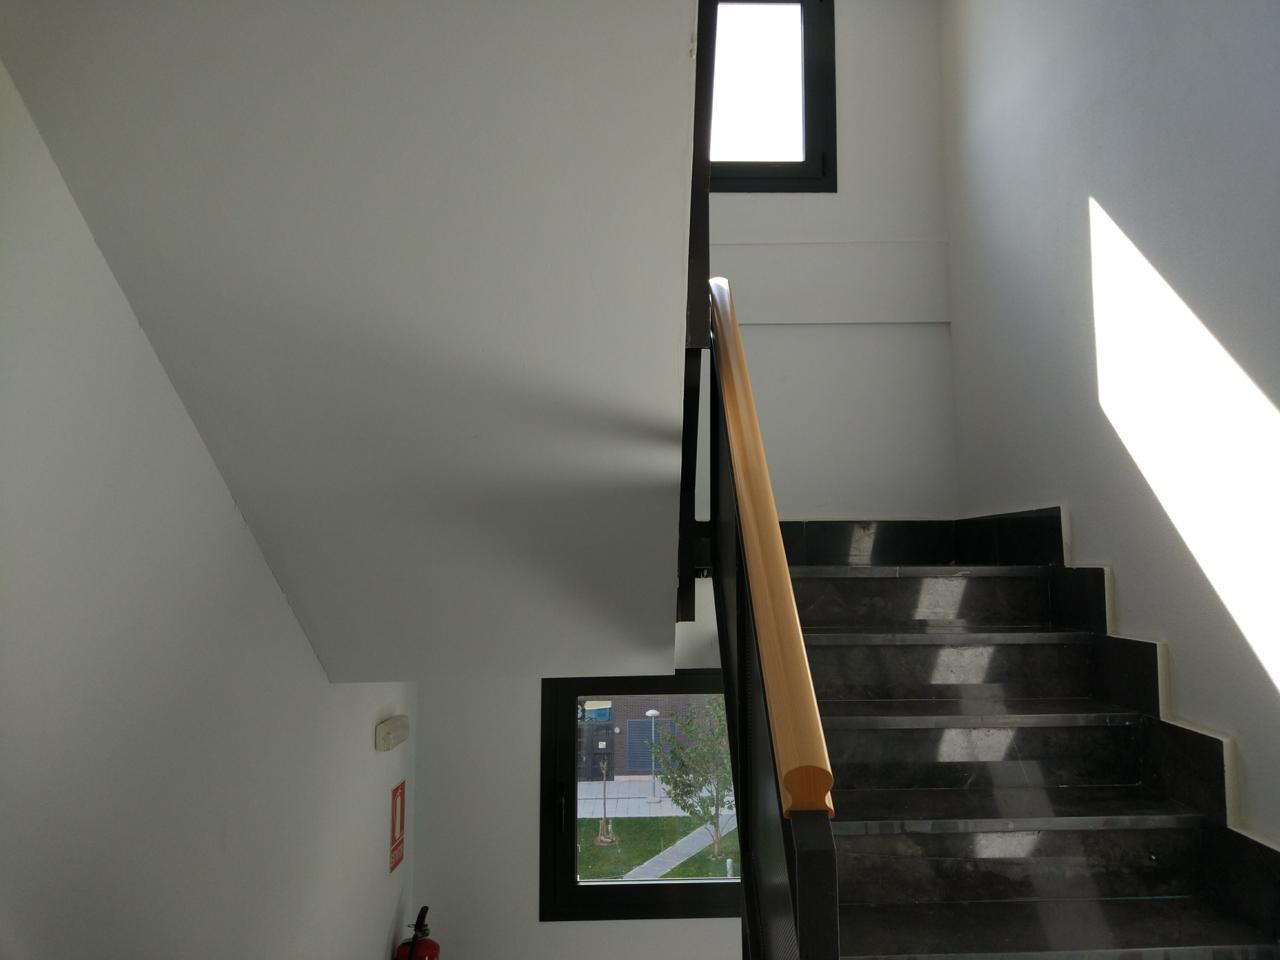 piso inversores con inquilino obra nueva zaragoza|publipisos inmobiliarias-10